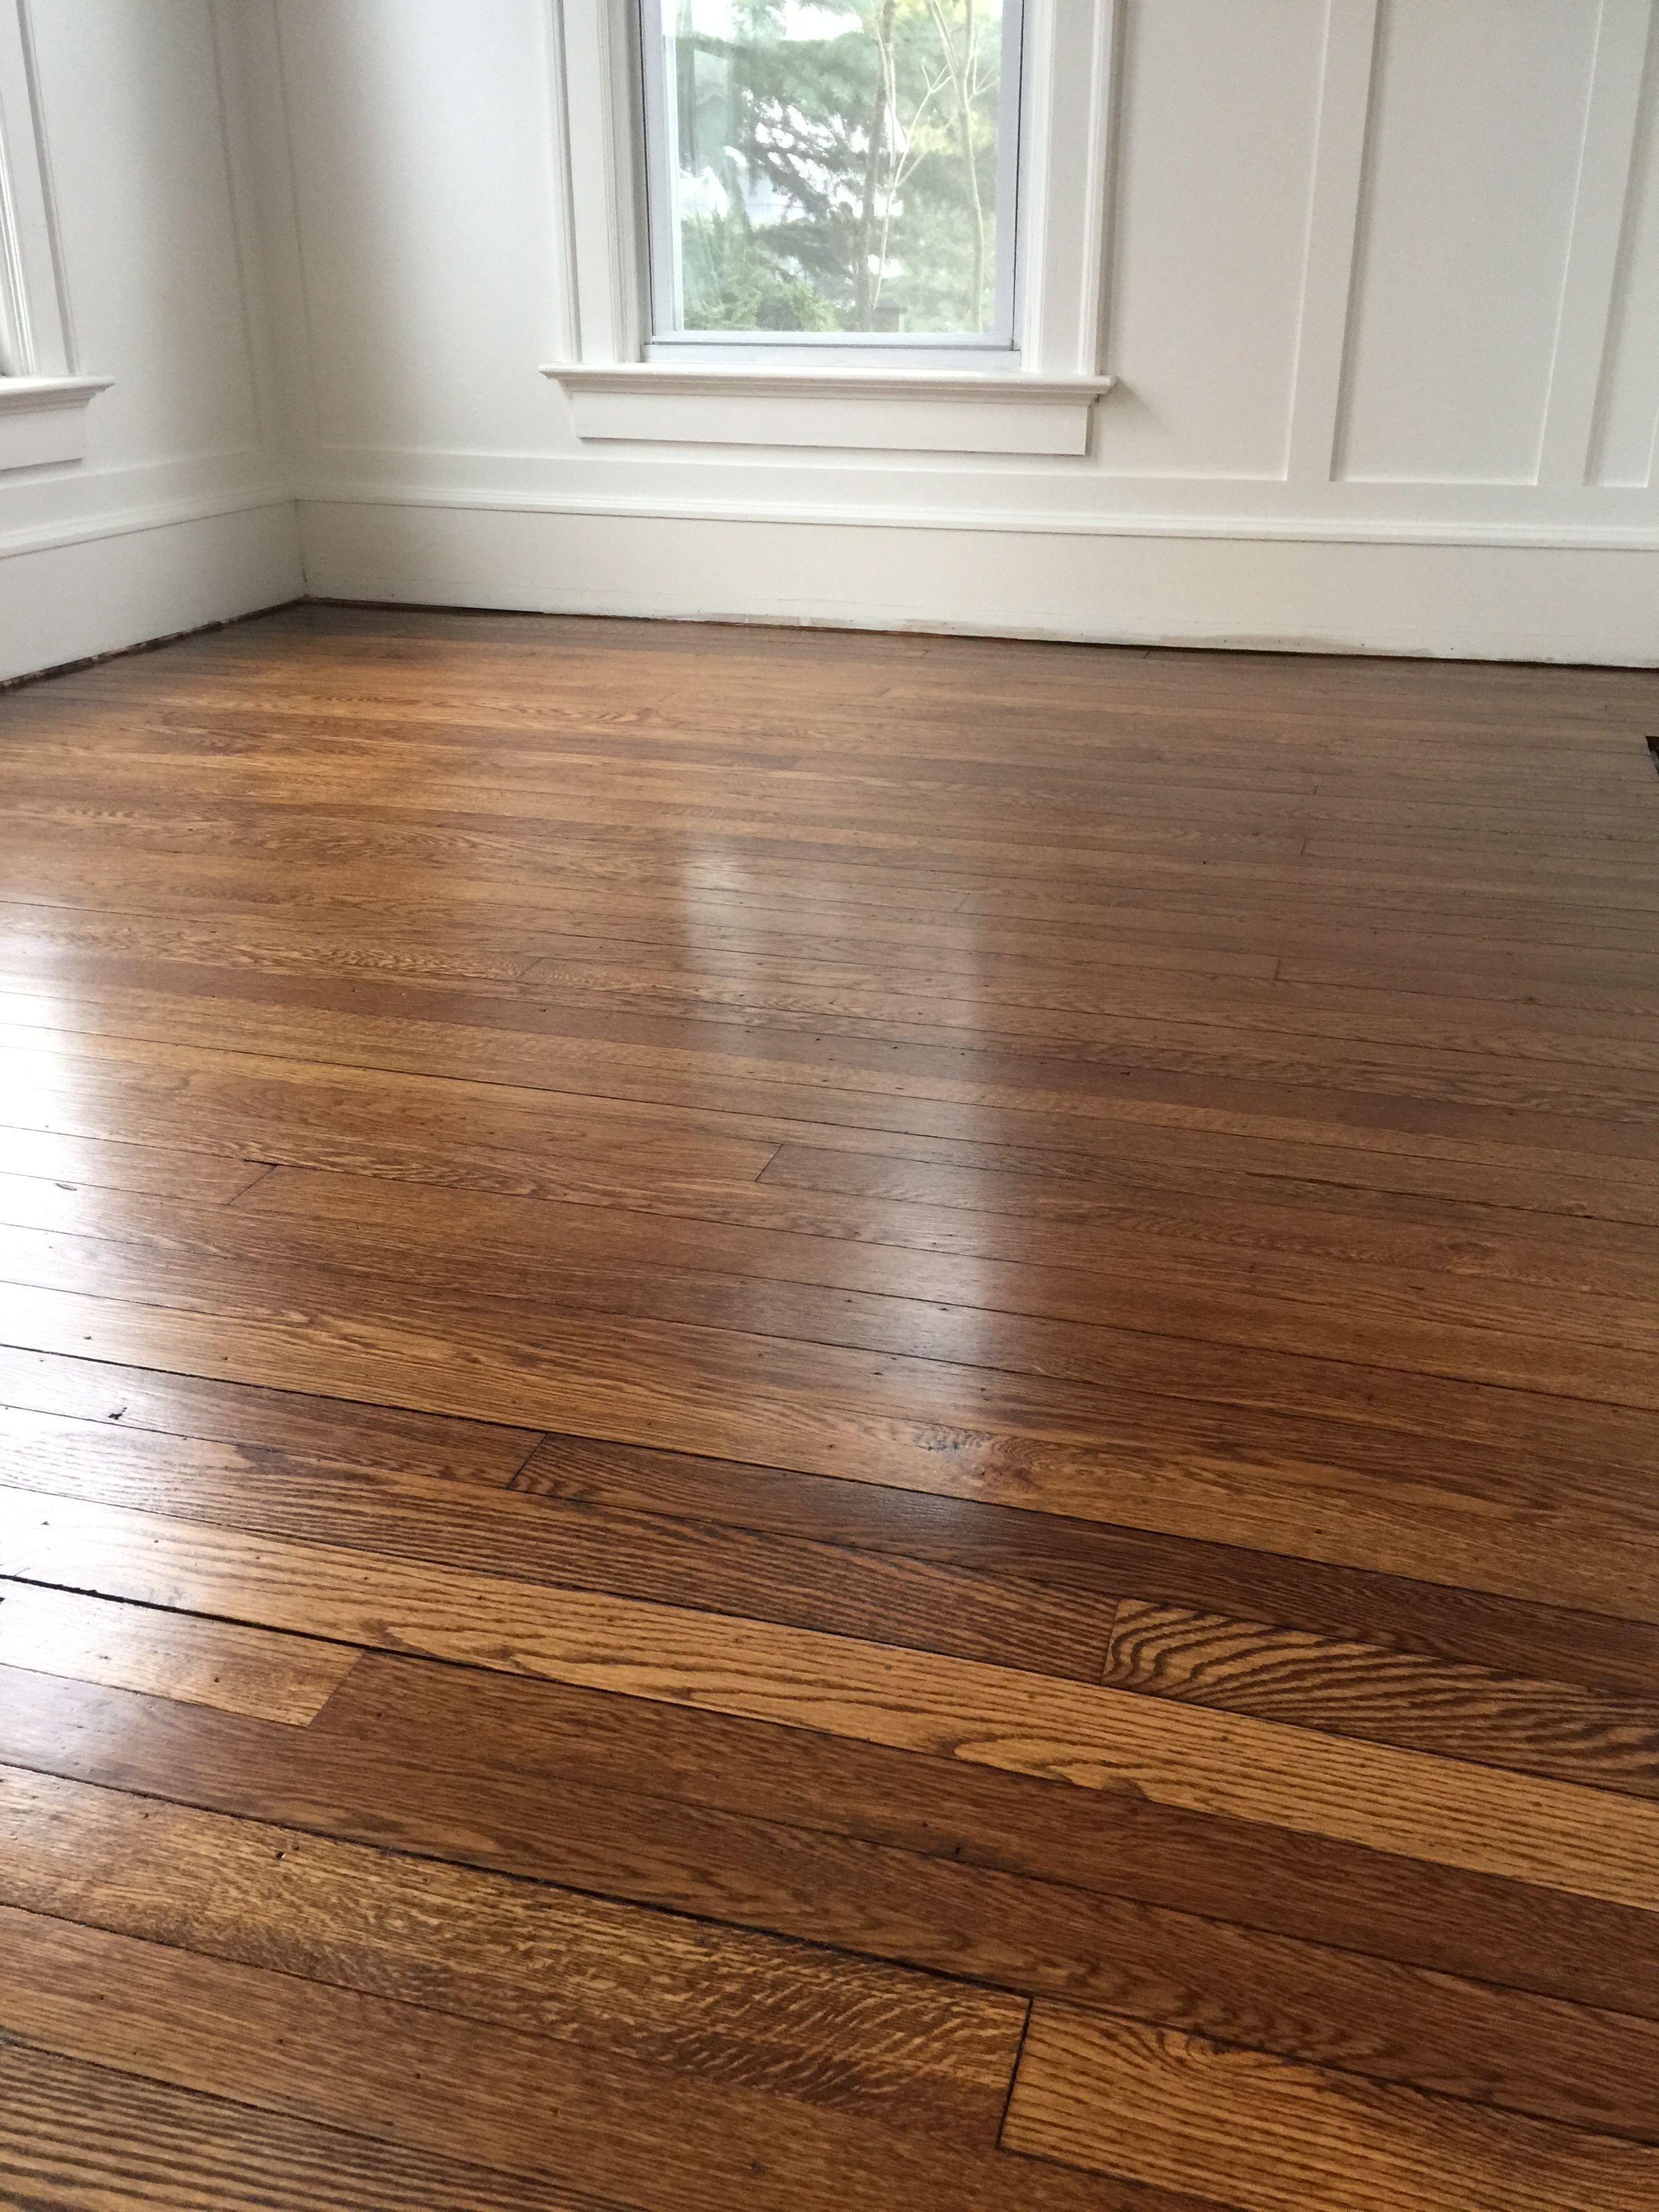 Basement Floor Ideas Cheap How To Paint